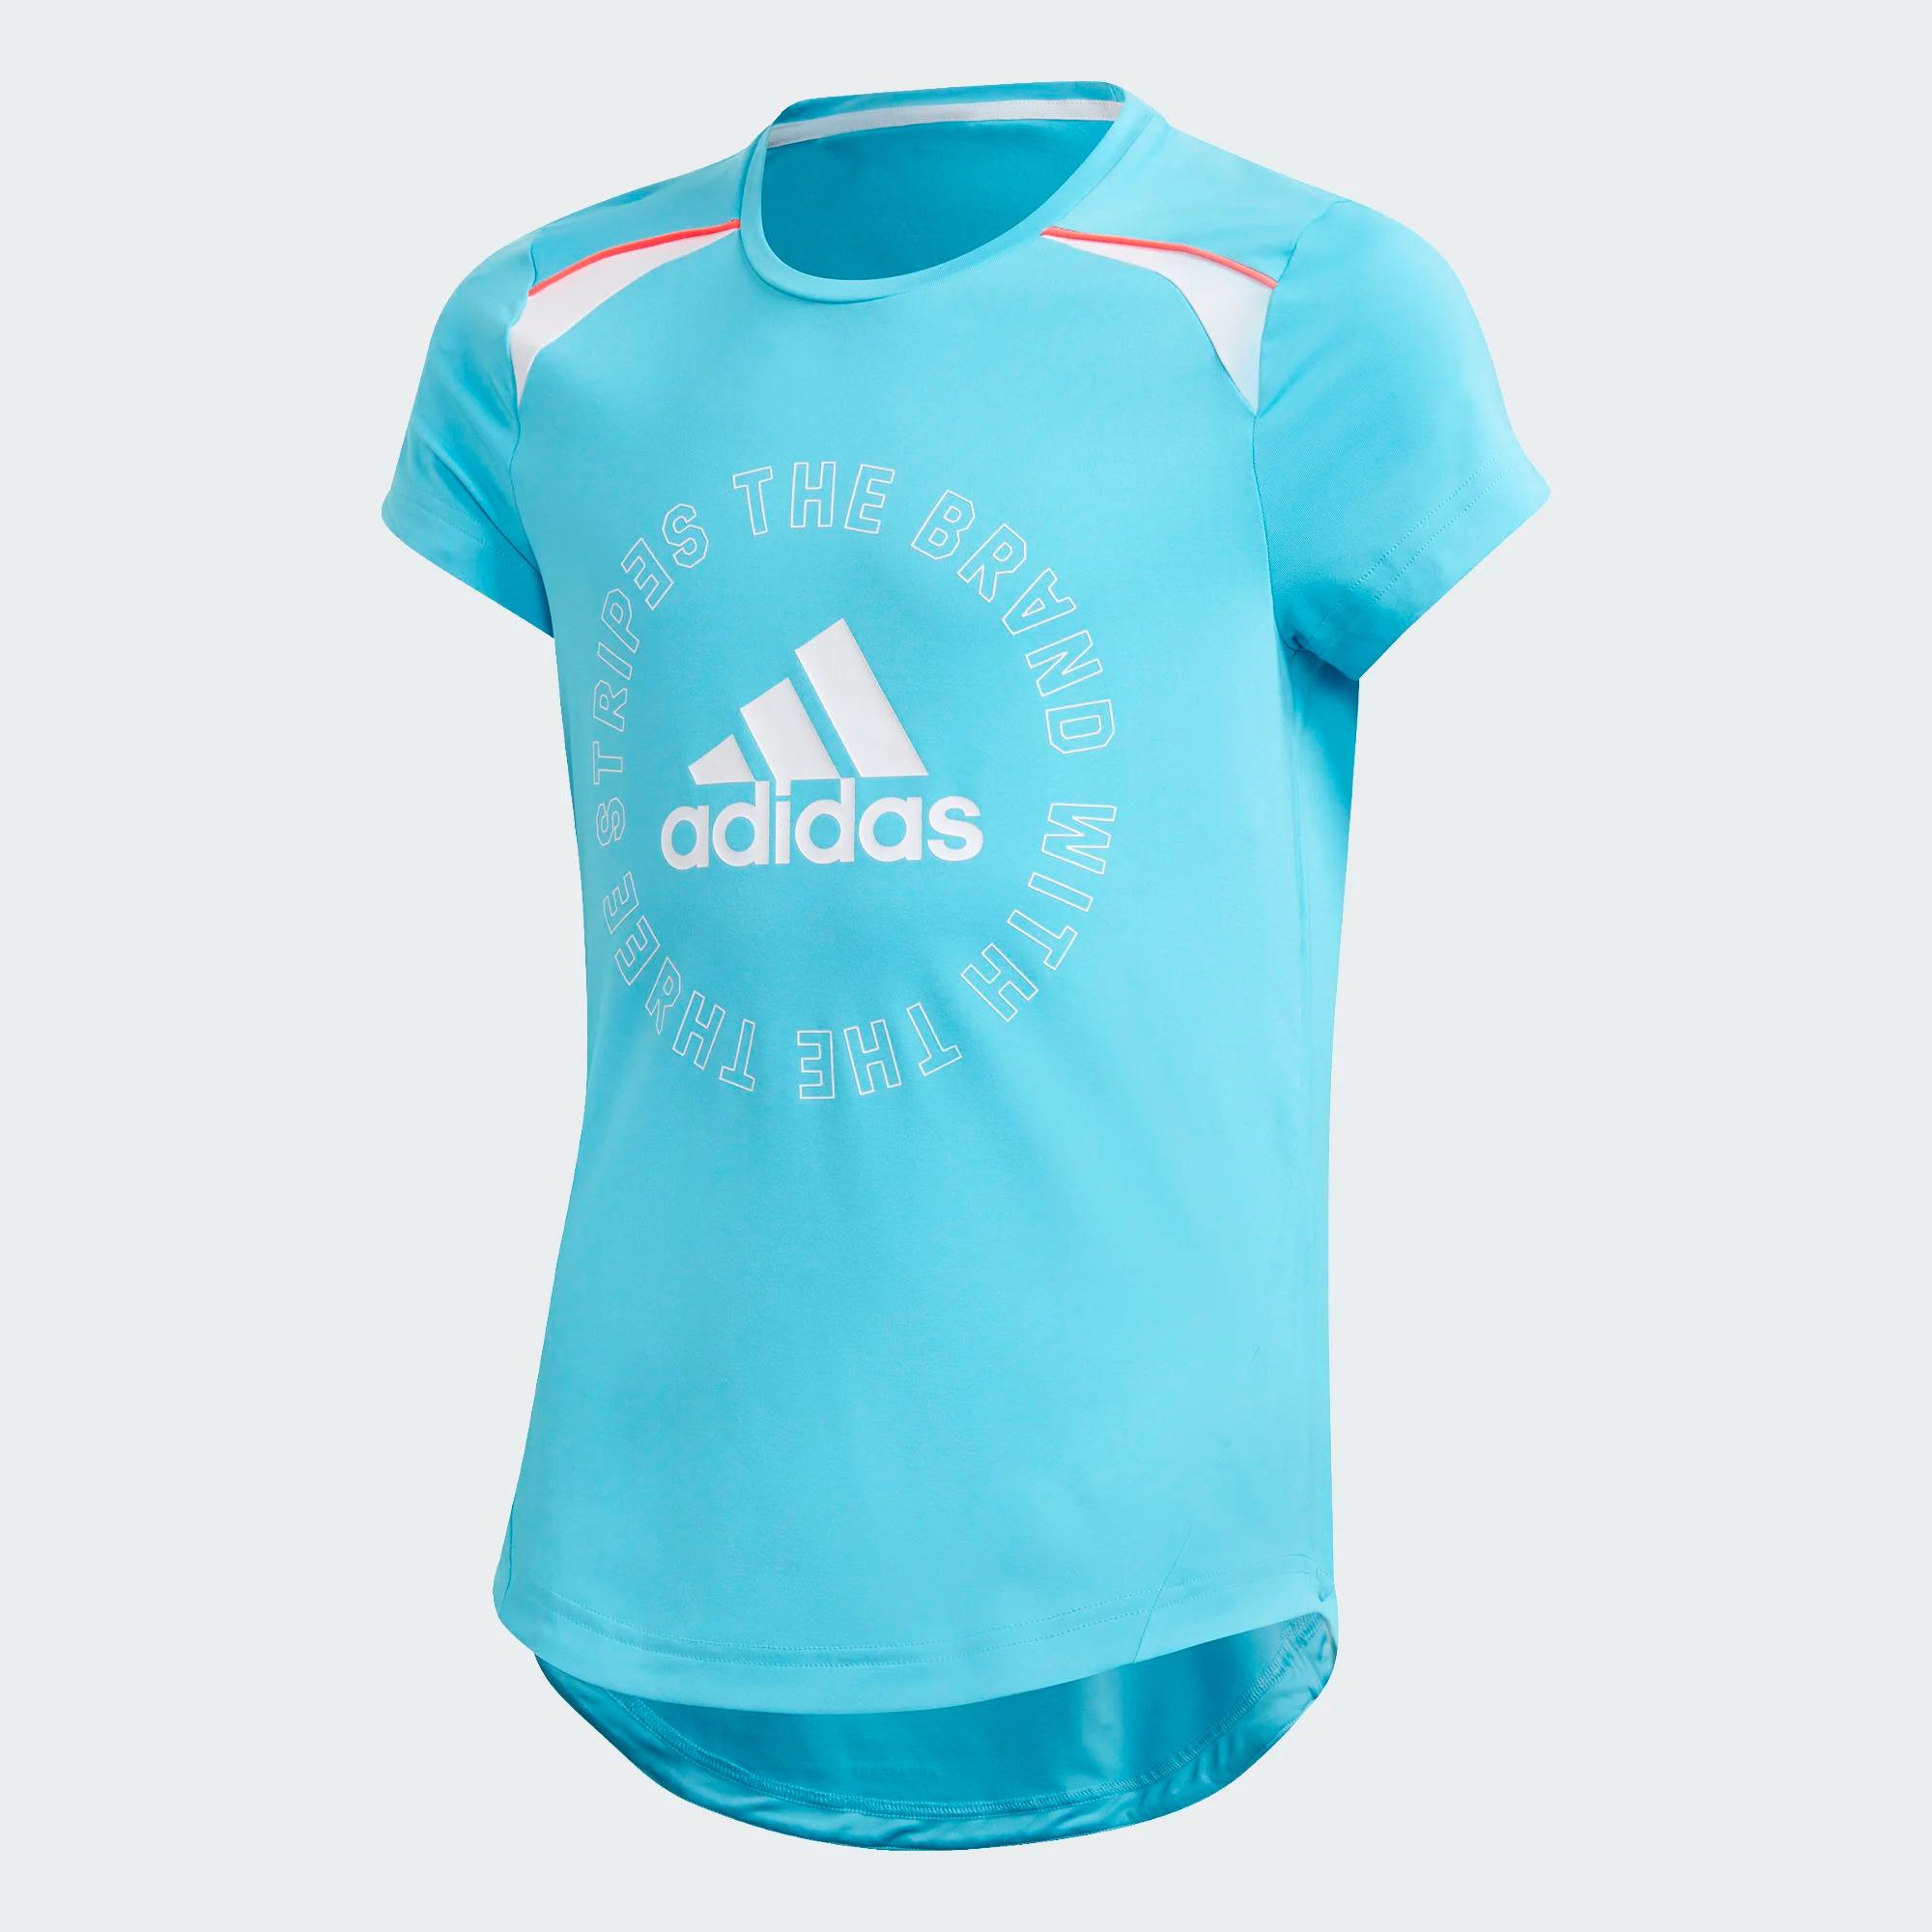 Adidas Mädchen Trainings T-Shirt Bold Aeroeady